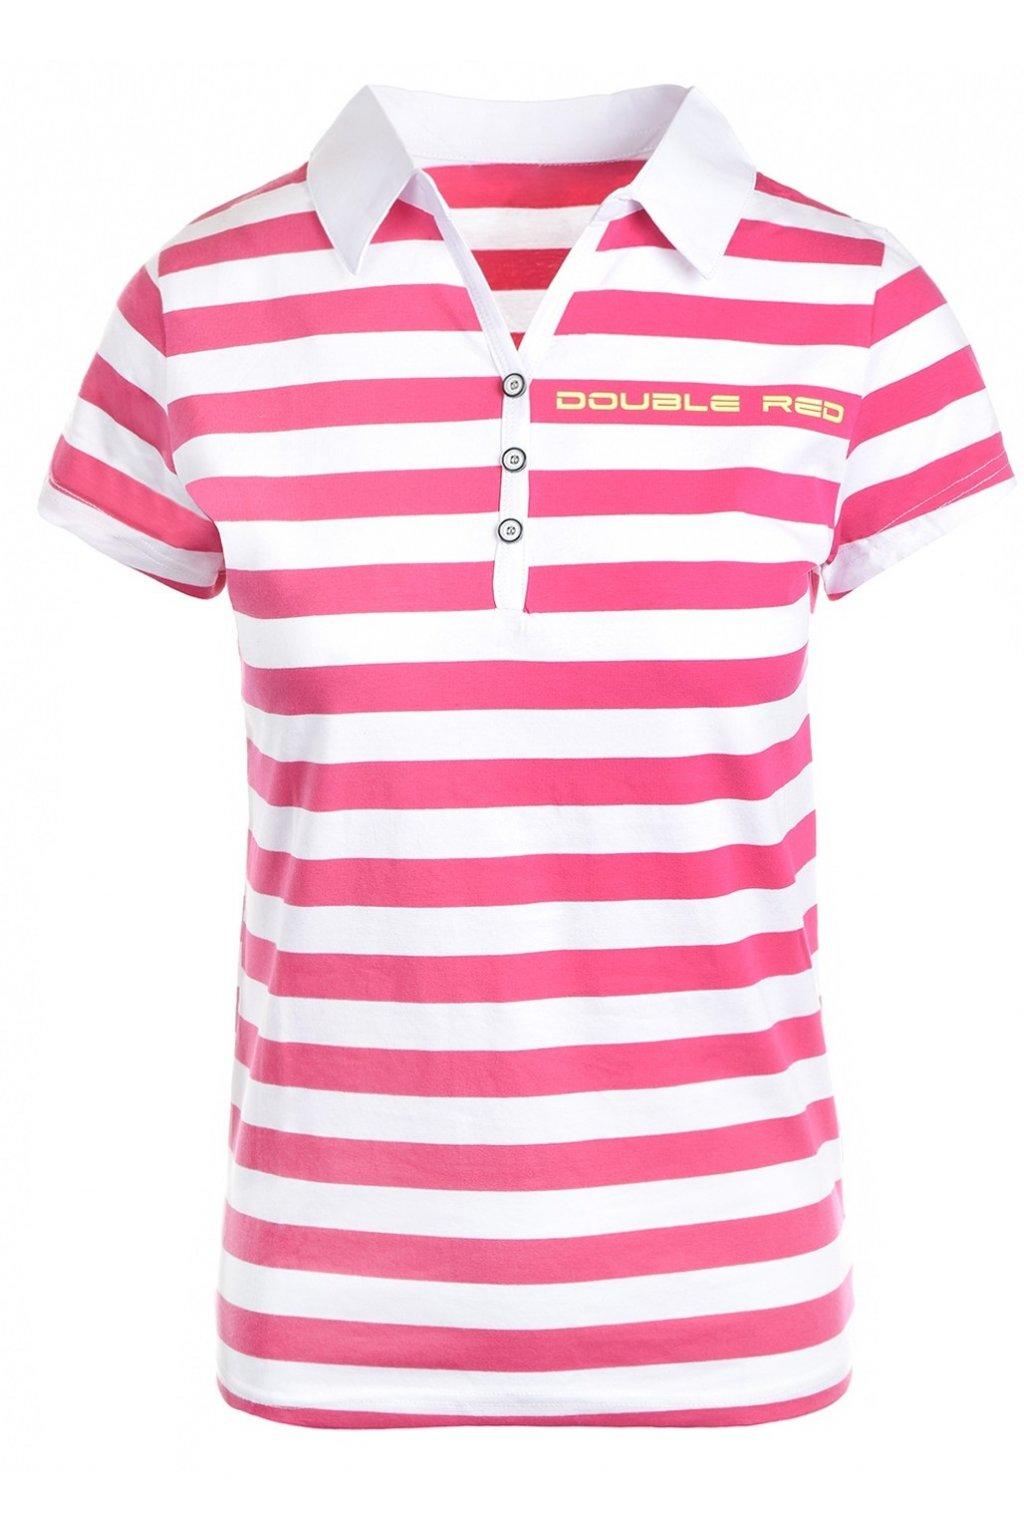 Double Red dámské triko Nautica CrazyColor Pink/NeonYellow obr1